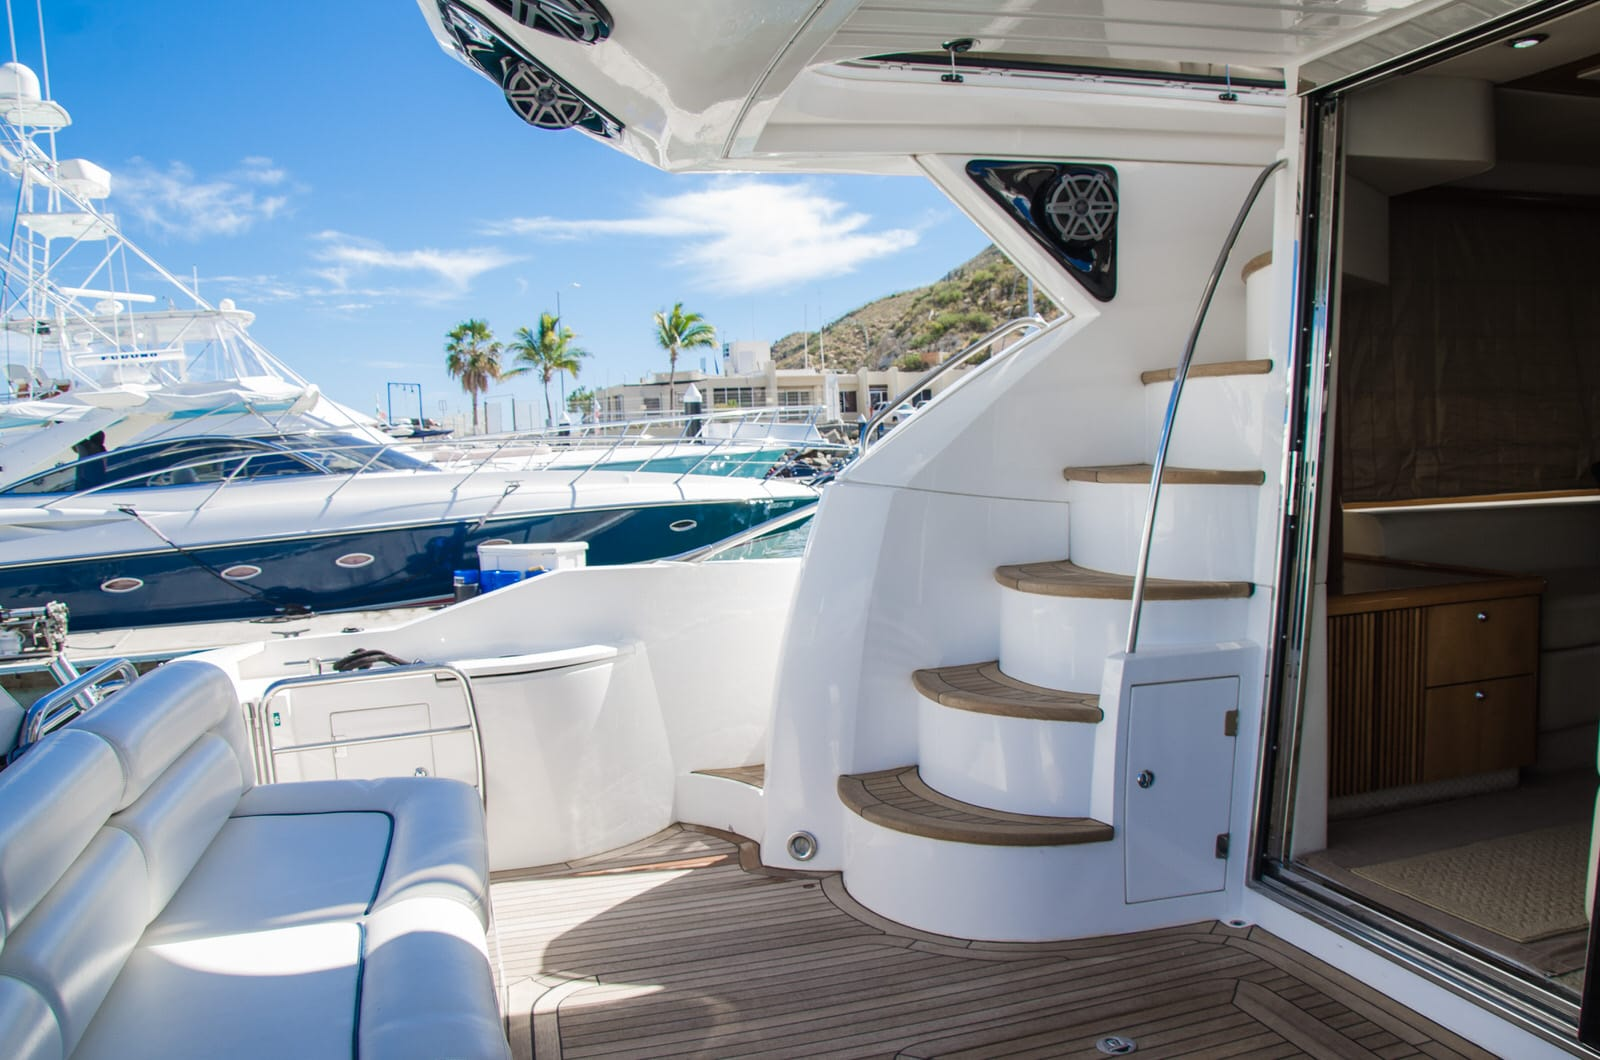 boat charter rental